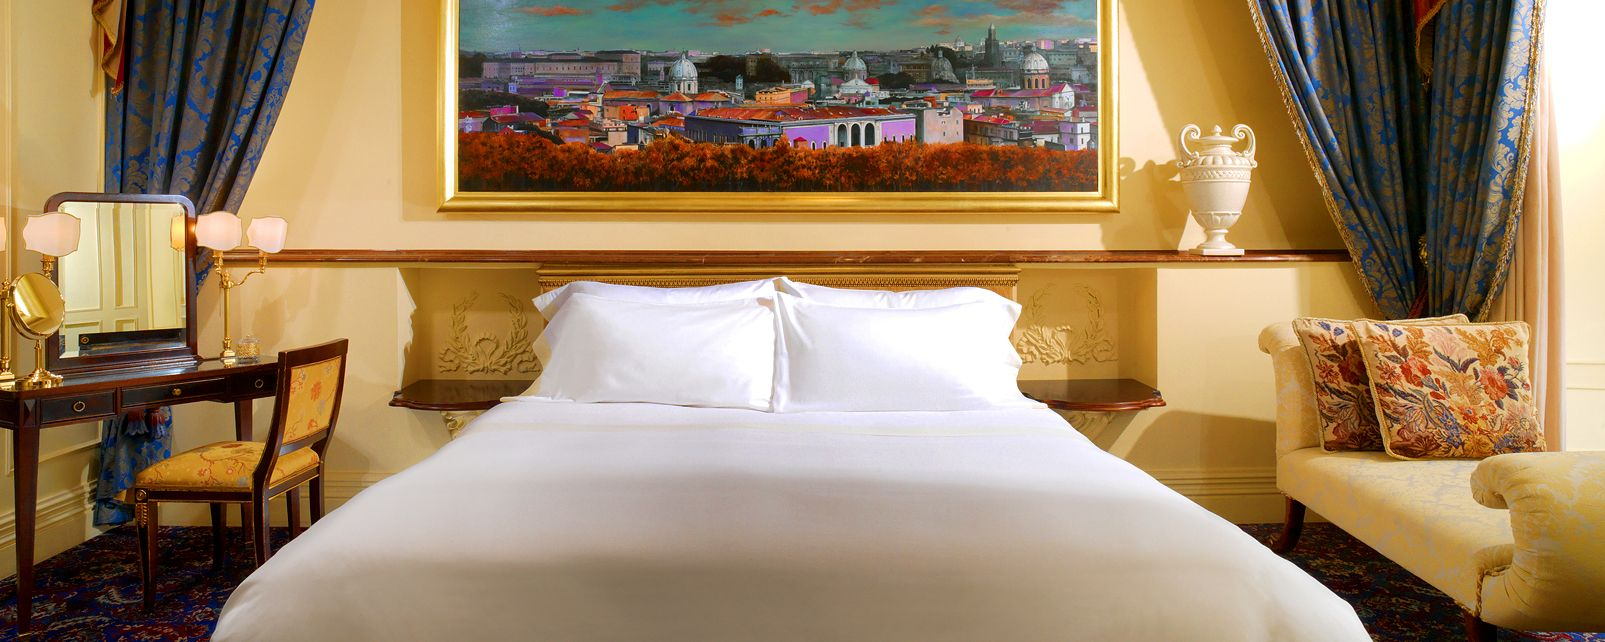 Hôtel St Regis Hotel